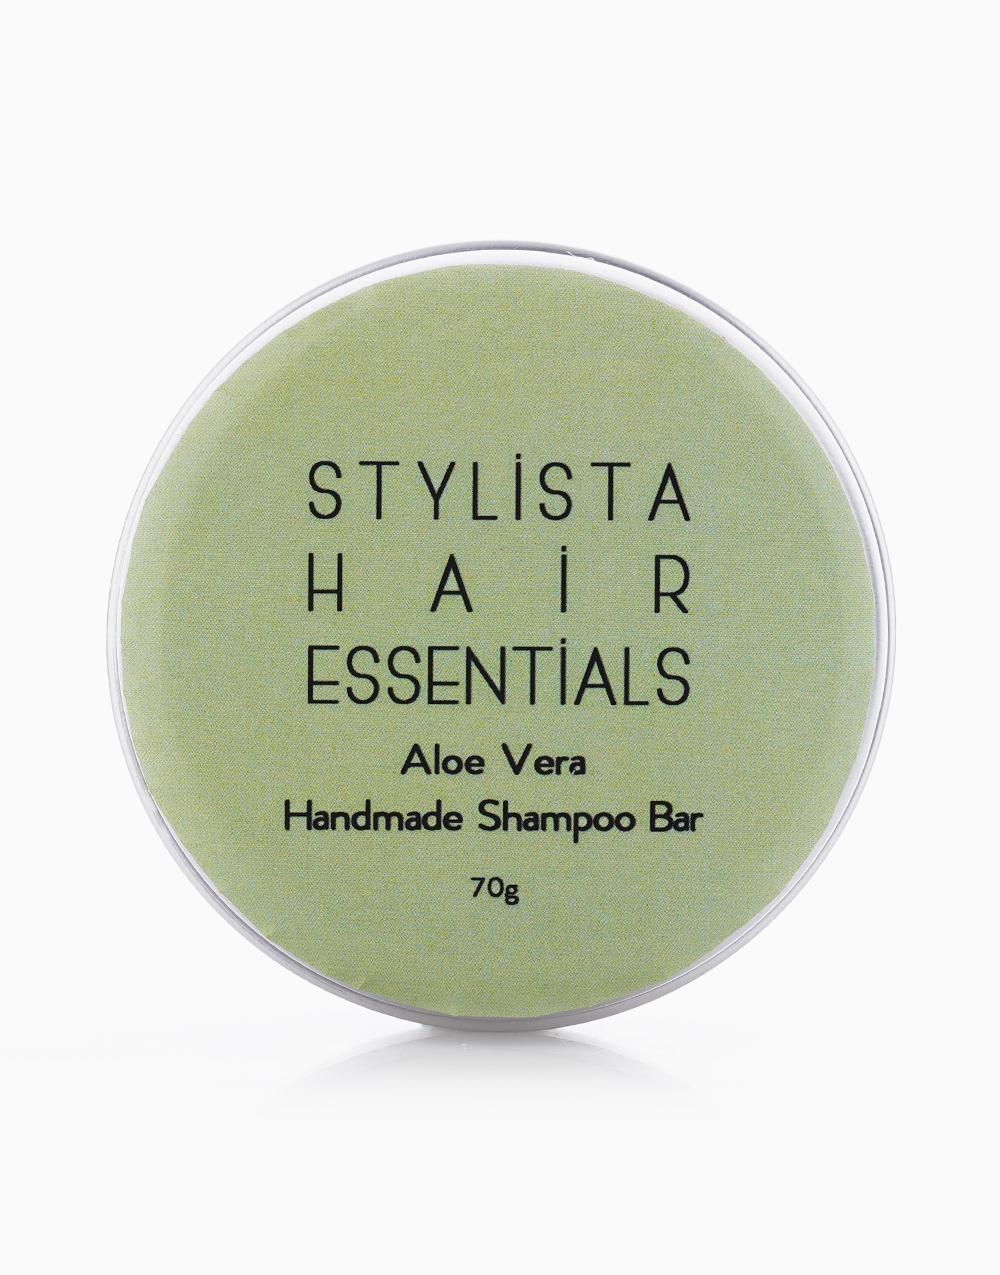 Handmade Natural Shampoo Bar in Aloe Vera by Stylista Hair Essentials